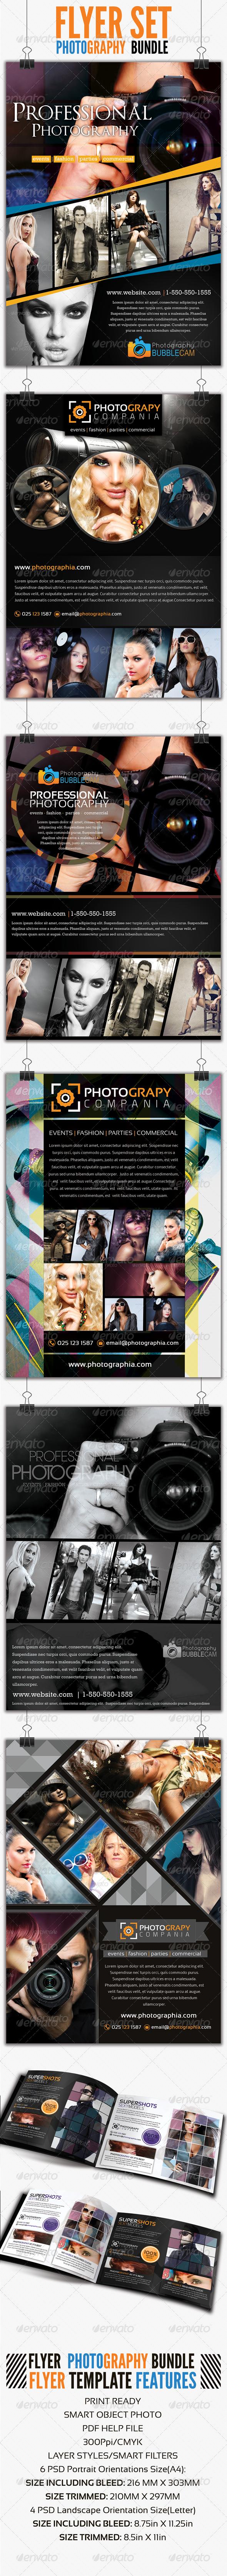 GraphicRiver Photography Flyer Bundle Set 1 4344366